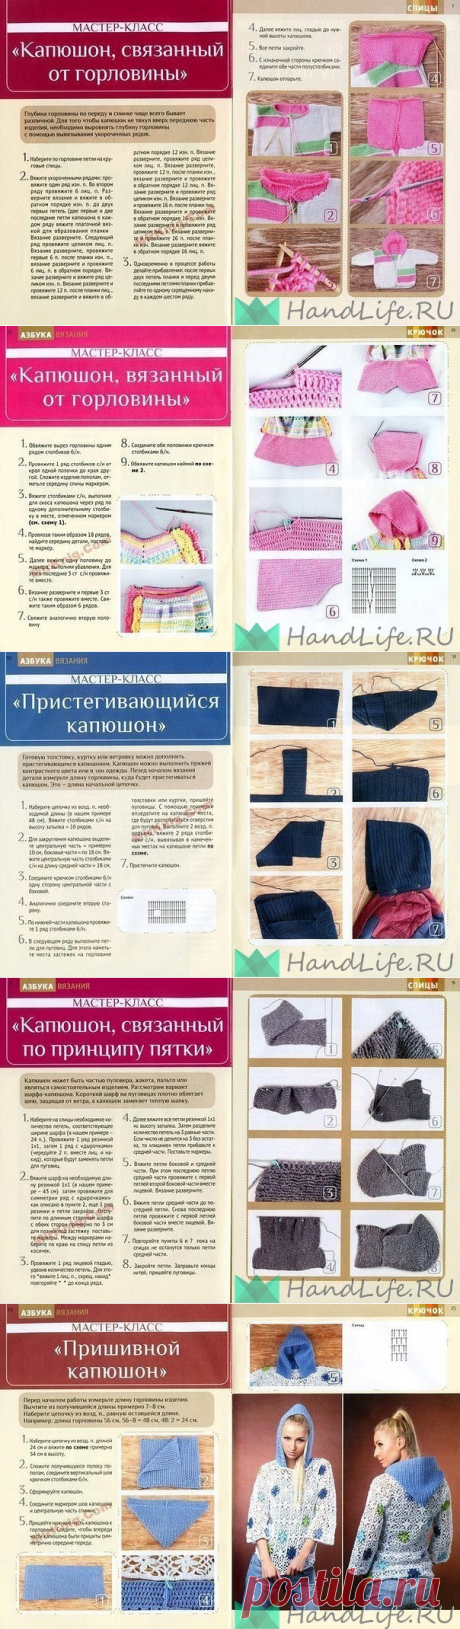 Вяжем капюшон / Мое творчество - вязание